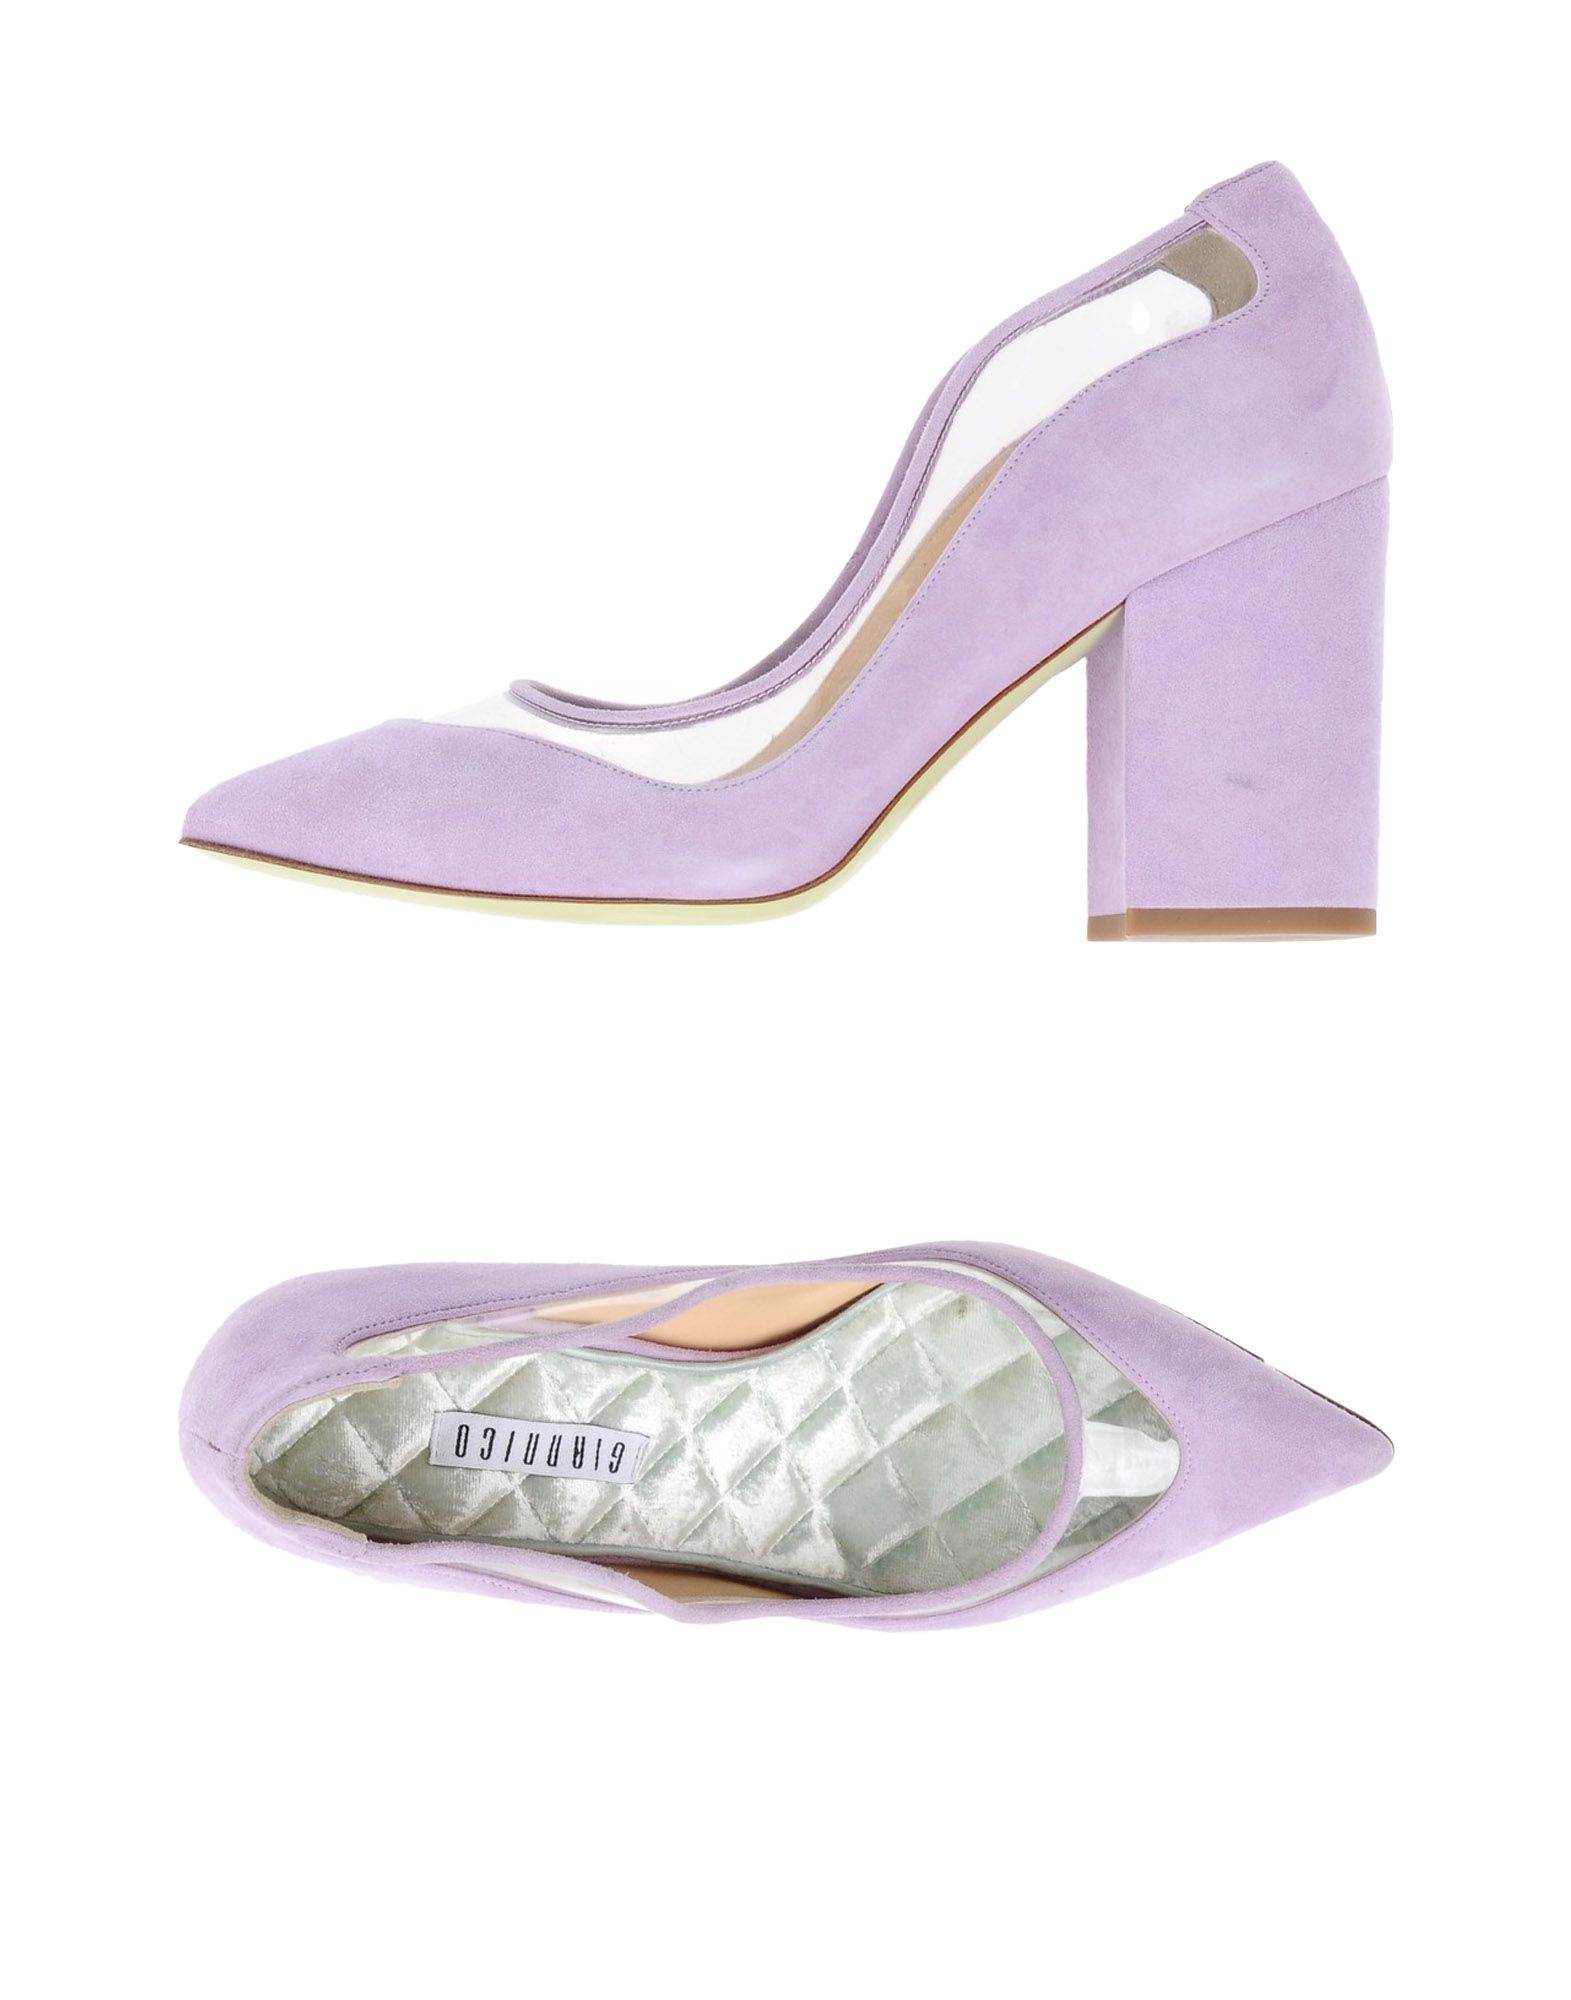 Rabatt Schuhe Giannico Pumps Damen  11338399TH